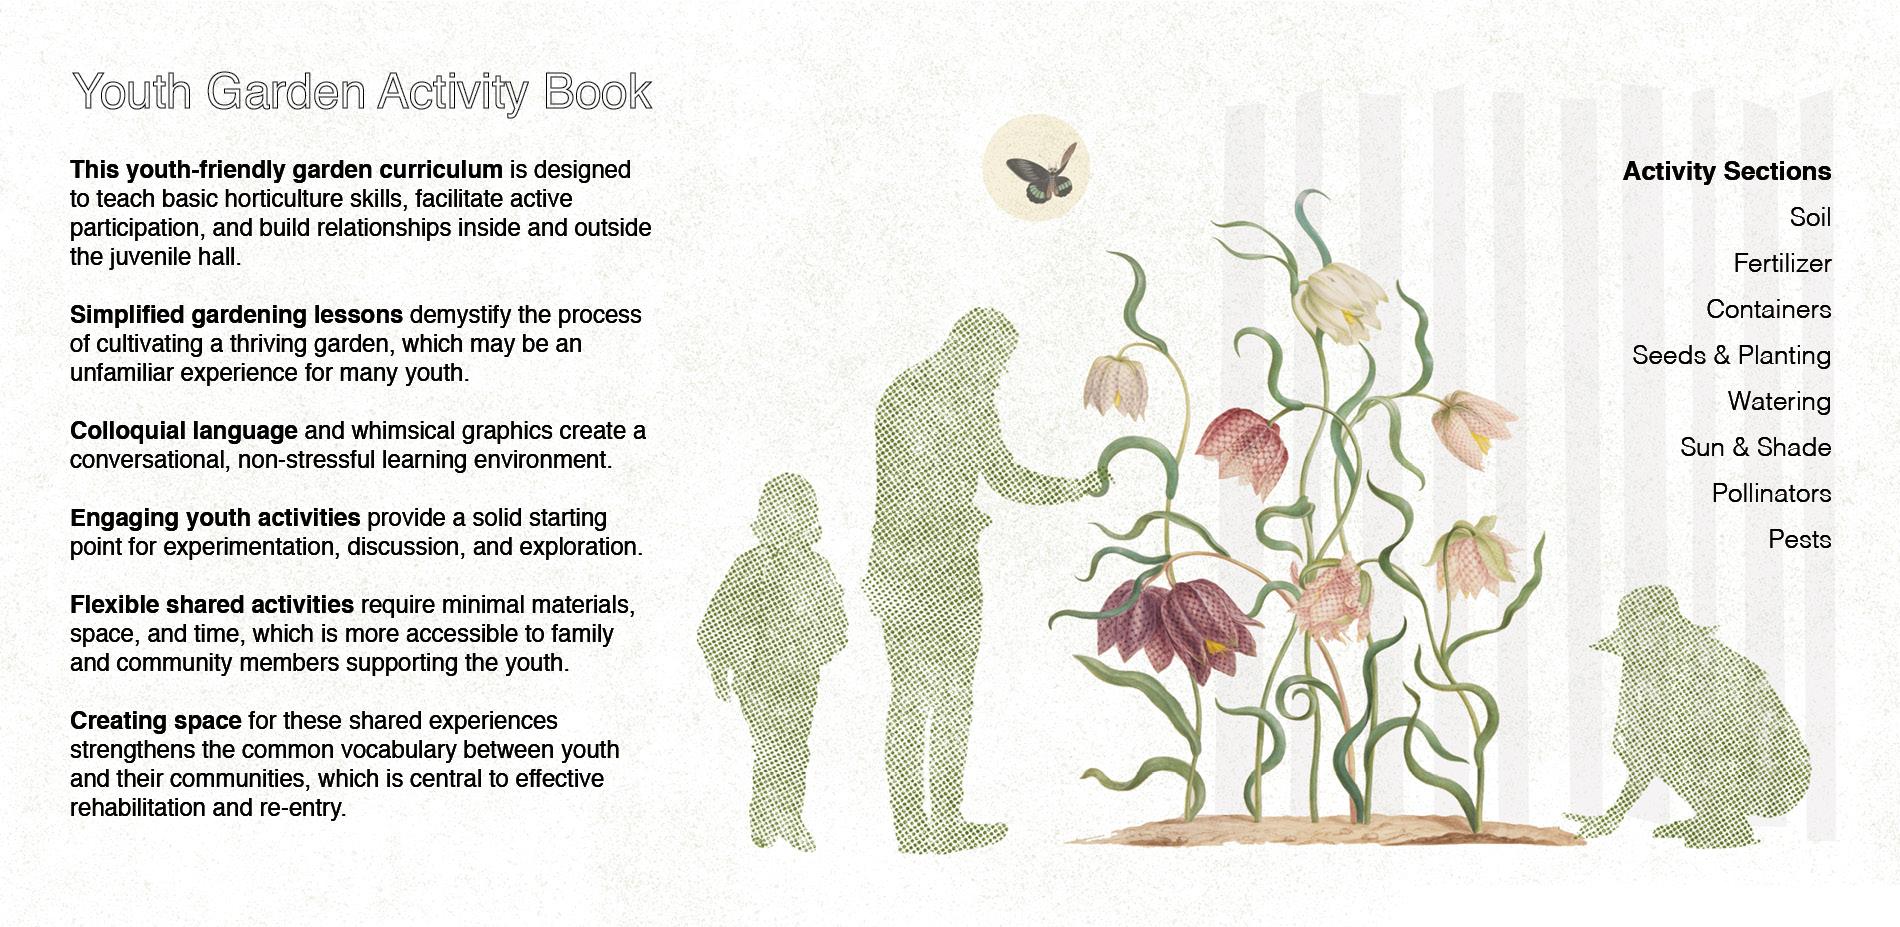 Youth Garden Curriculum